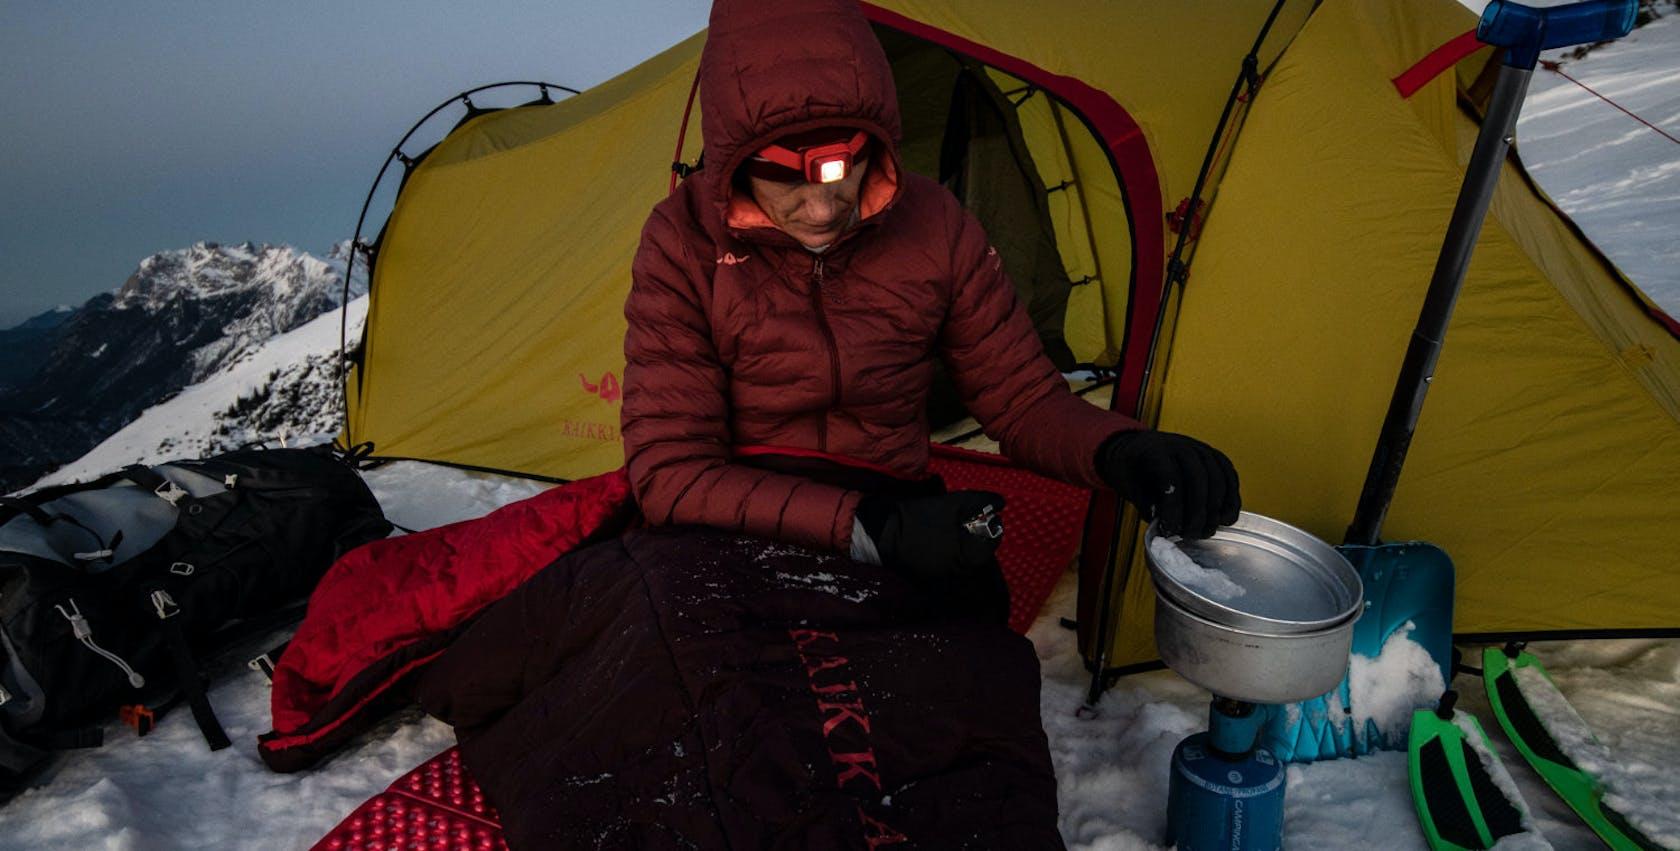 kaikkialla camping shop online